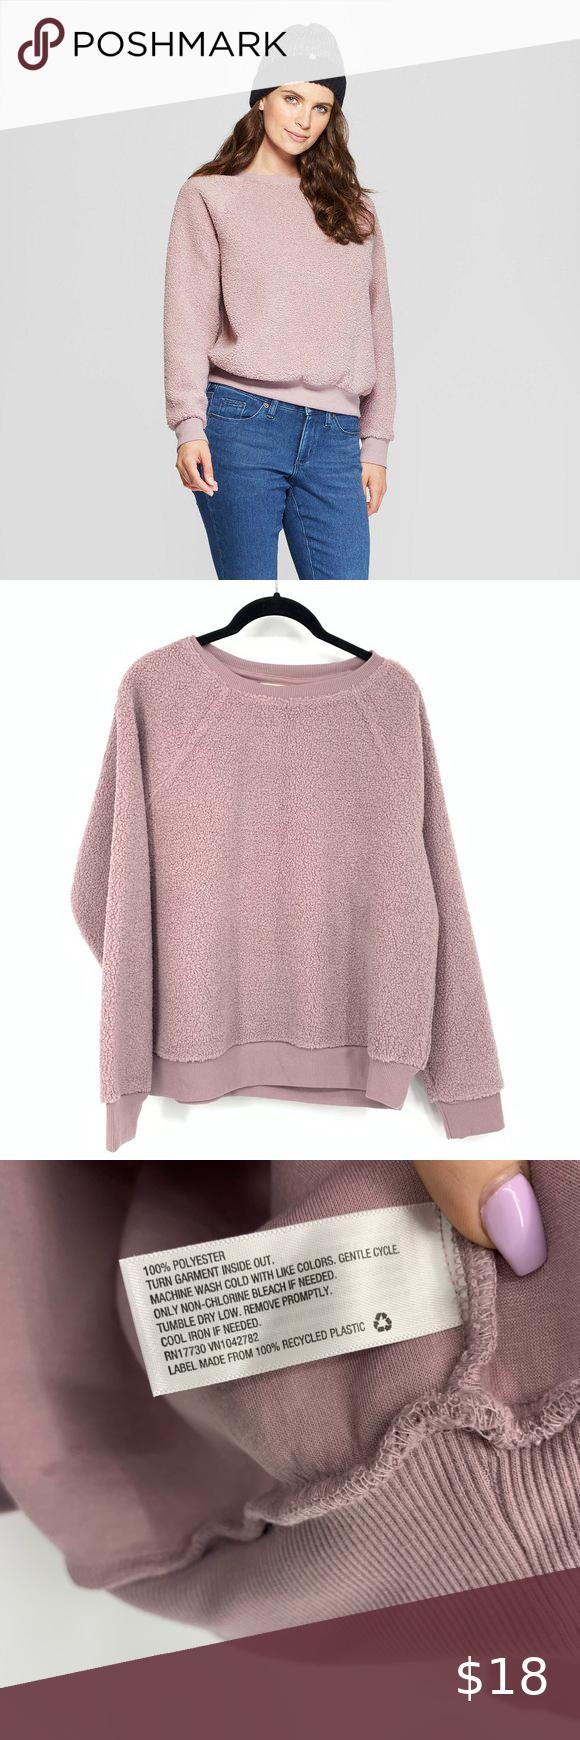 Universal Thread Lavender Sherpa Crewneck In 2020 Clothes Design Universal Thread Sweatshirt Tops [ 1740 x 580 Pixel ]